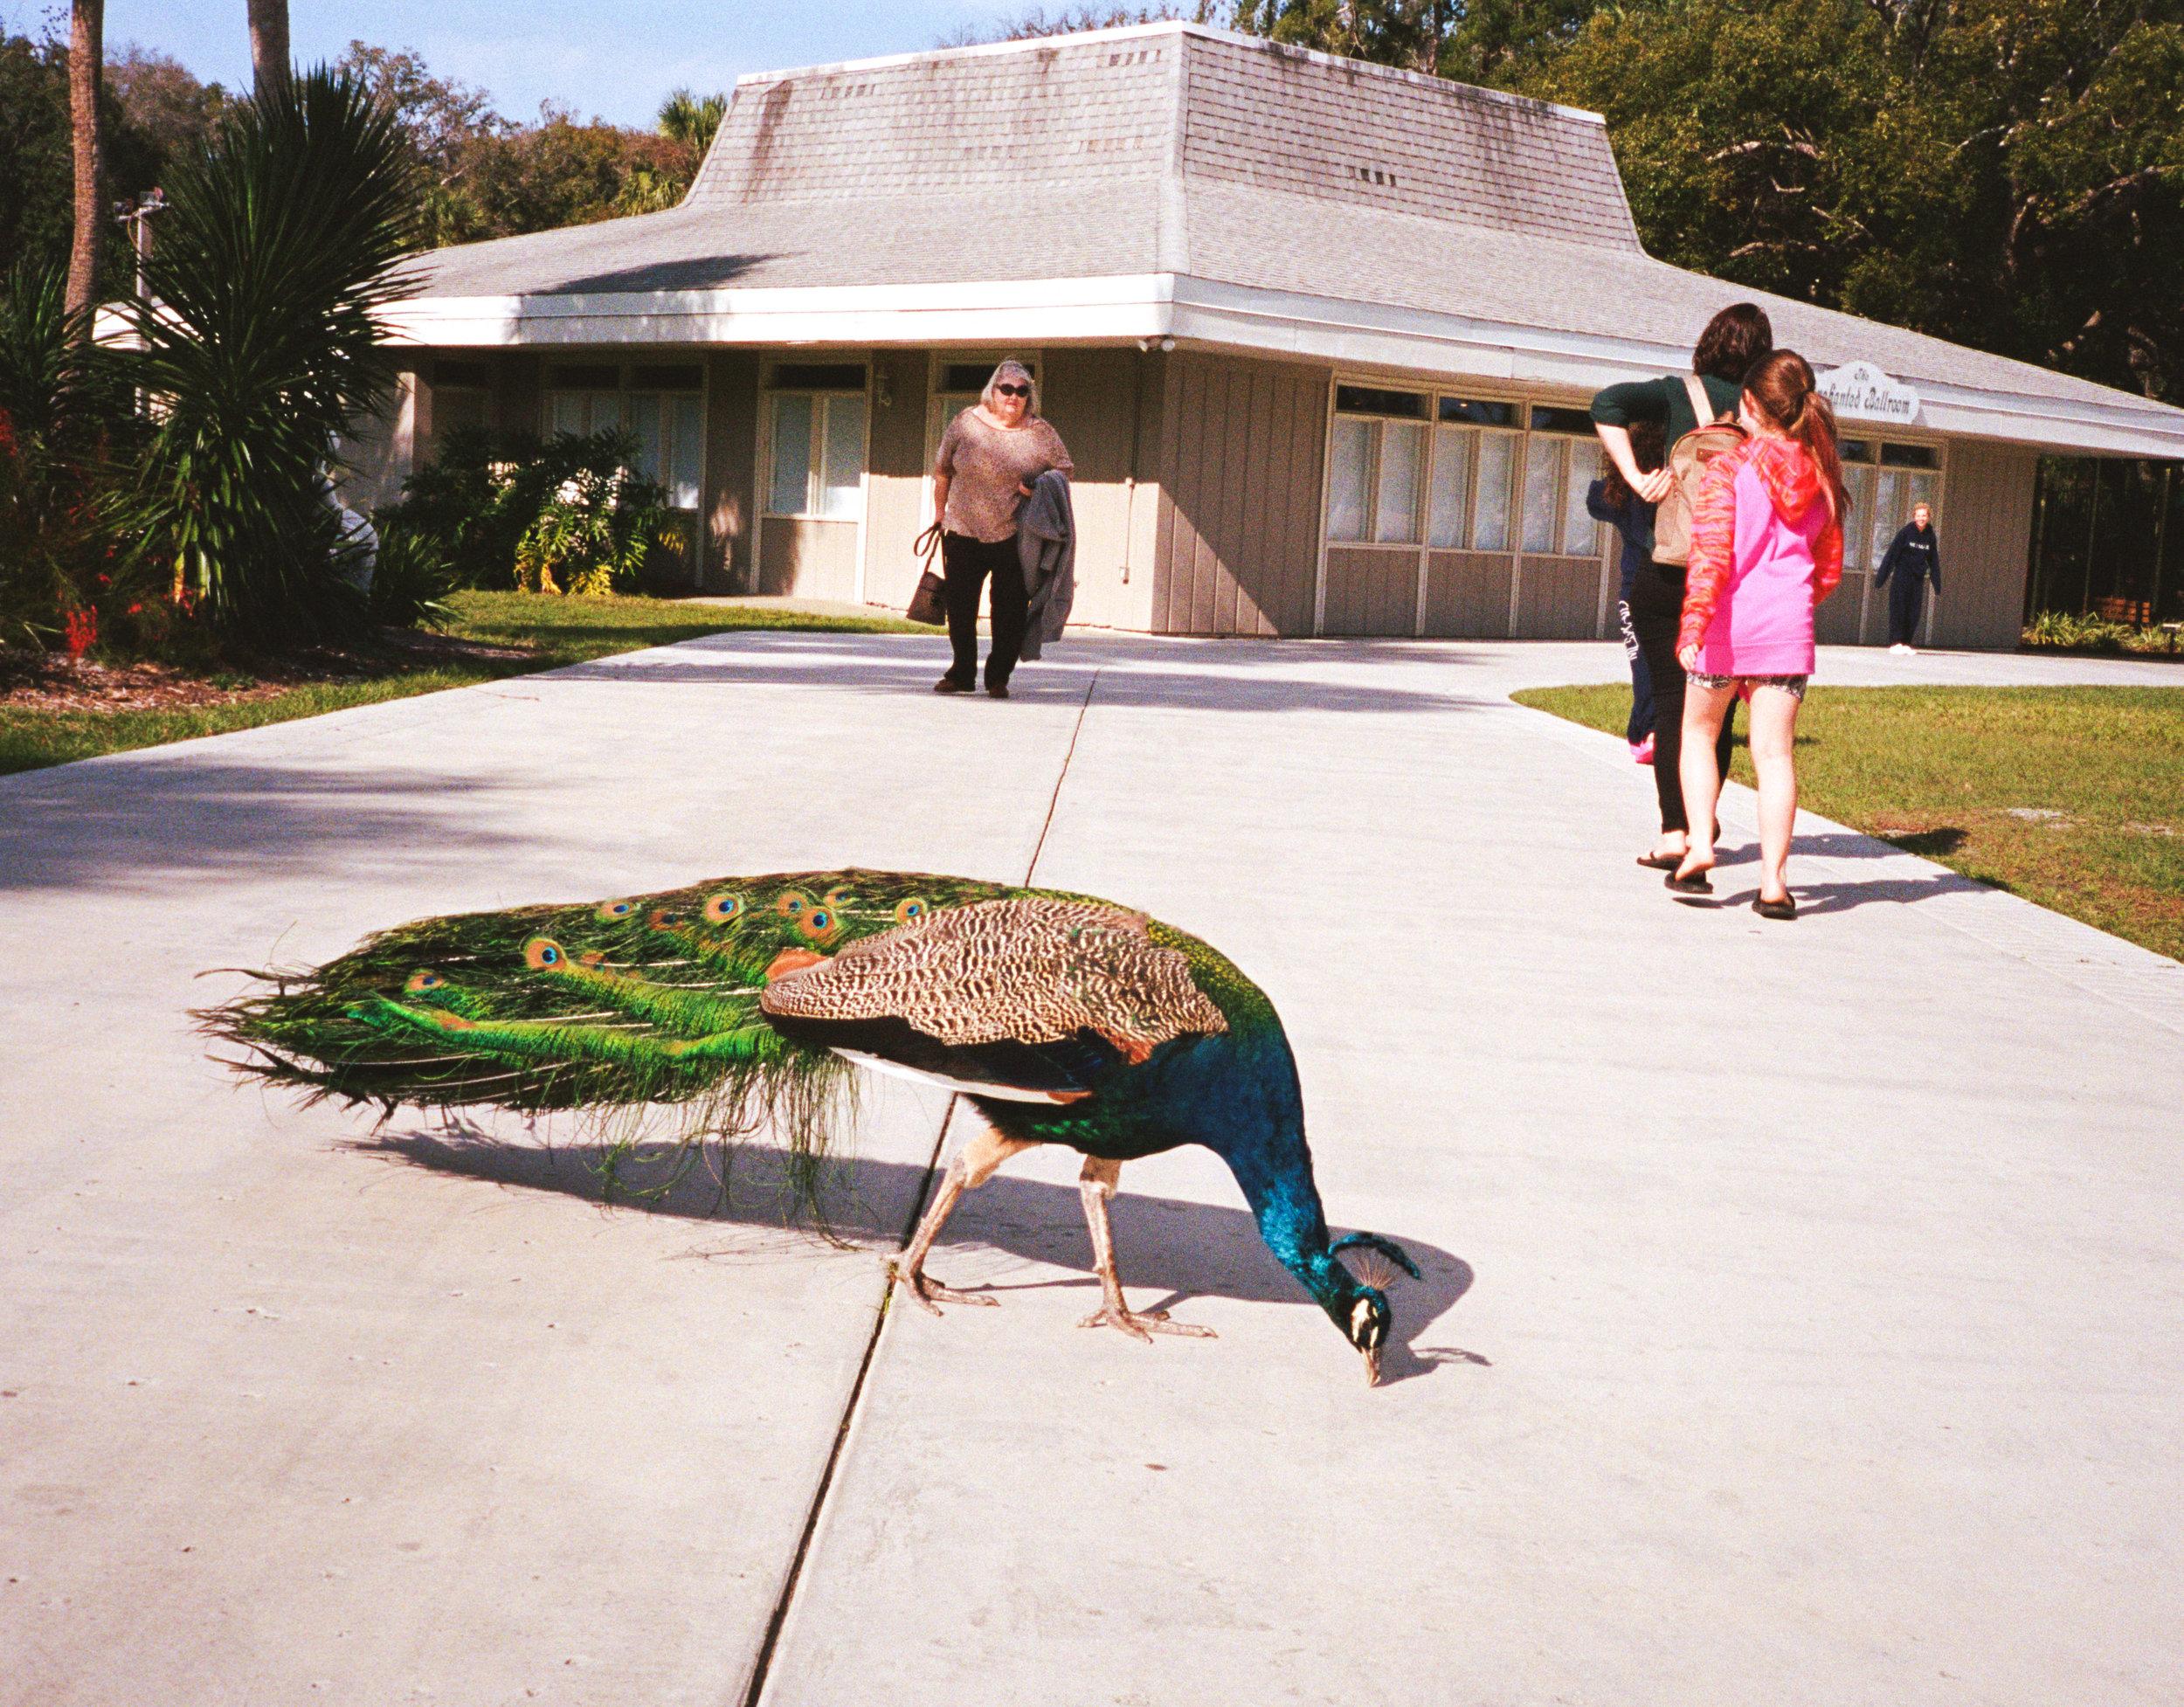 peacock2-1.jpg